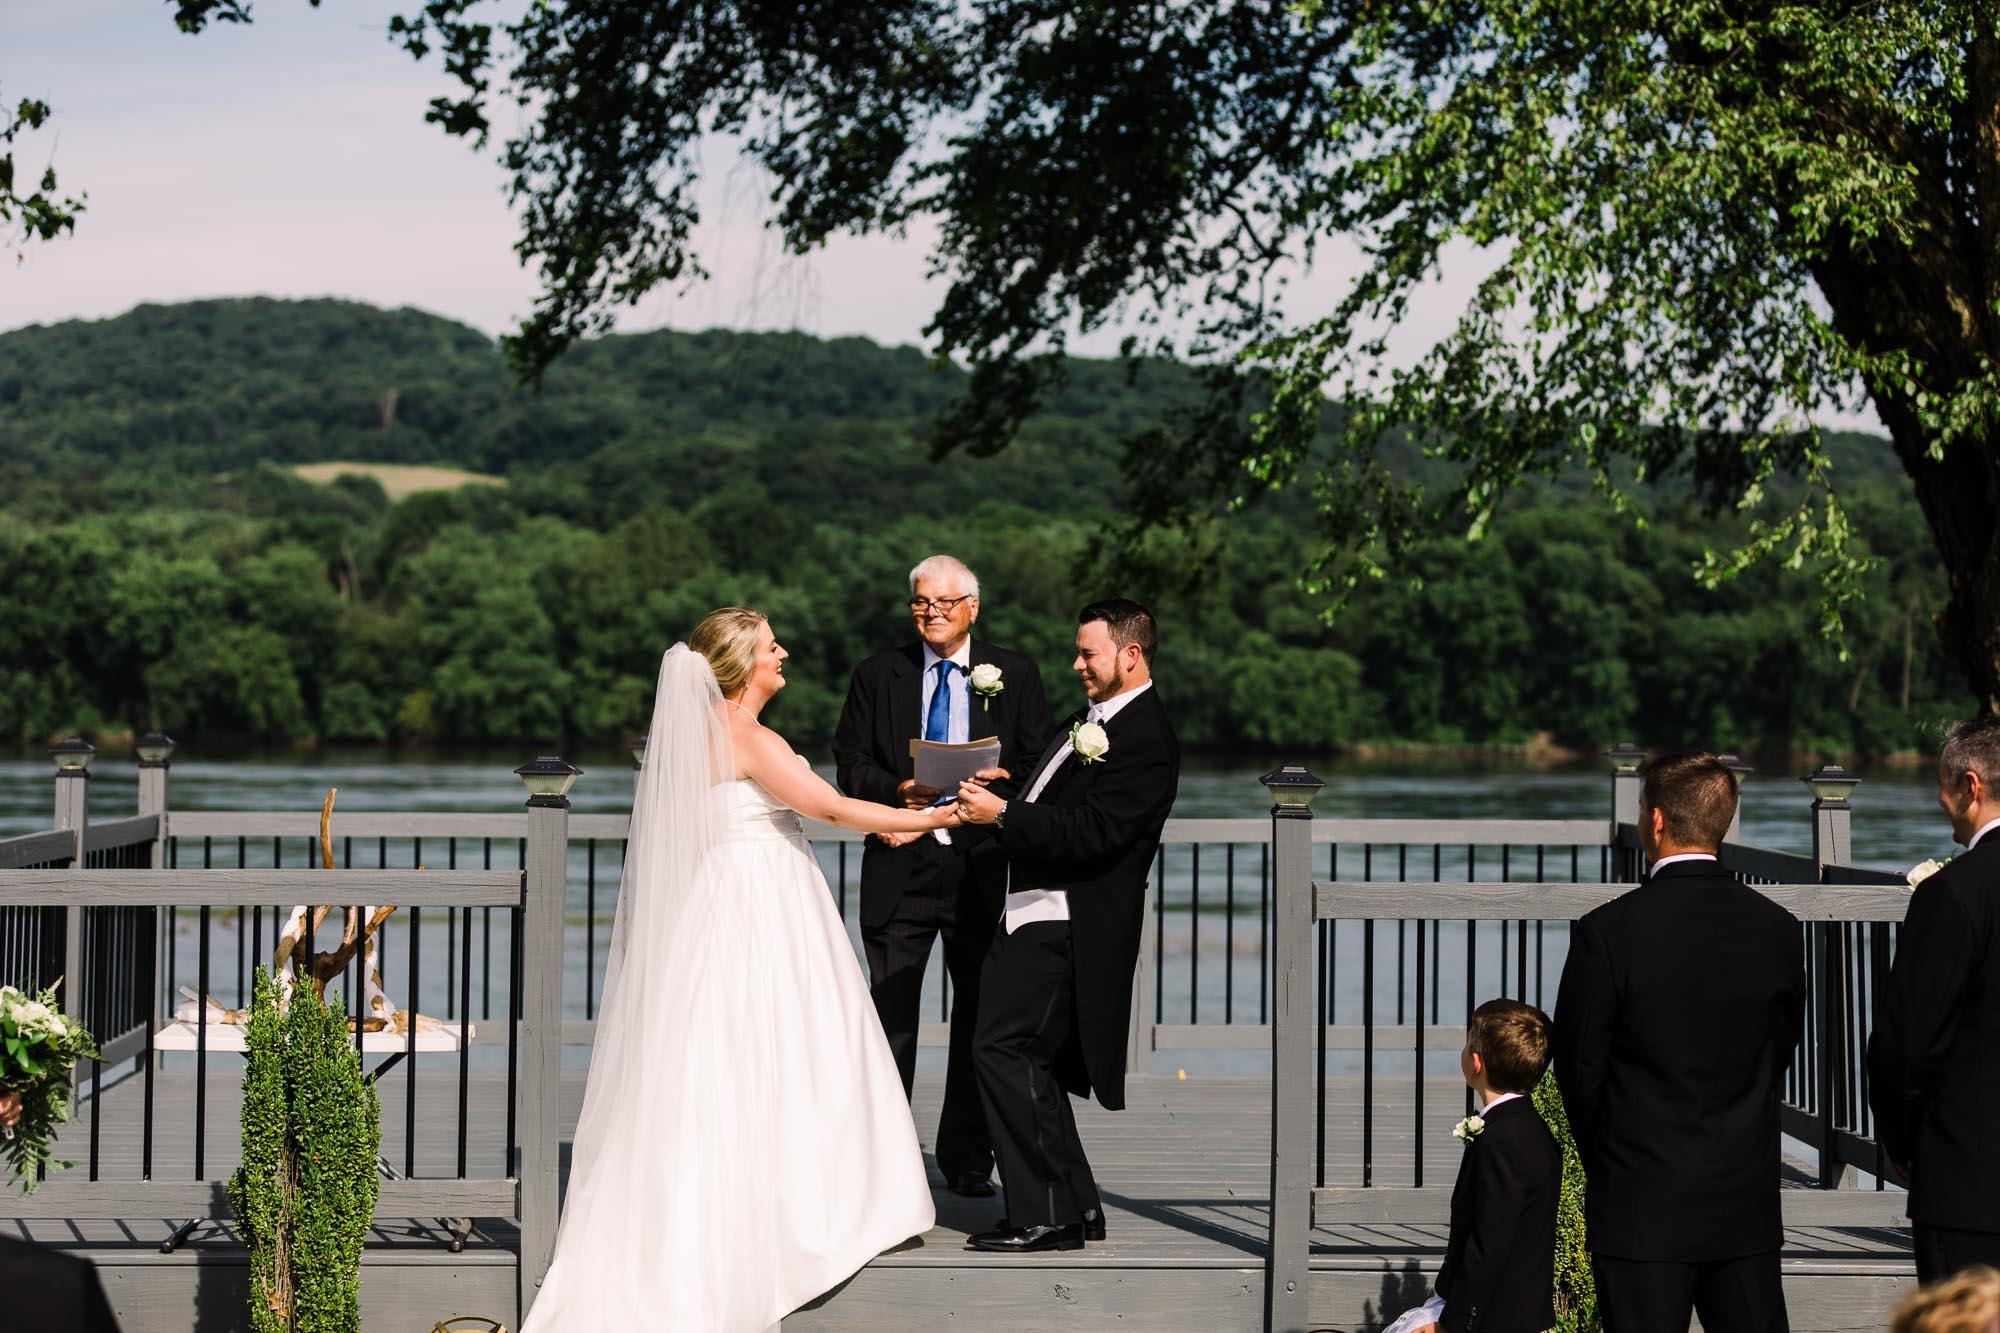 isle-of-que-wedding-3900.jpg